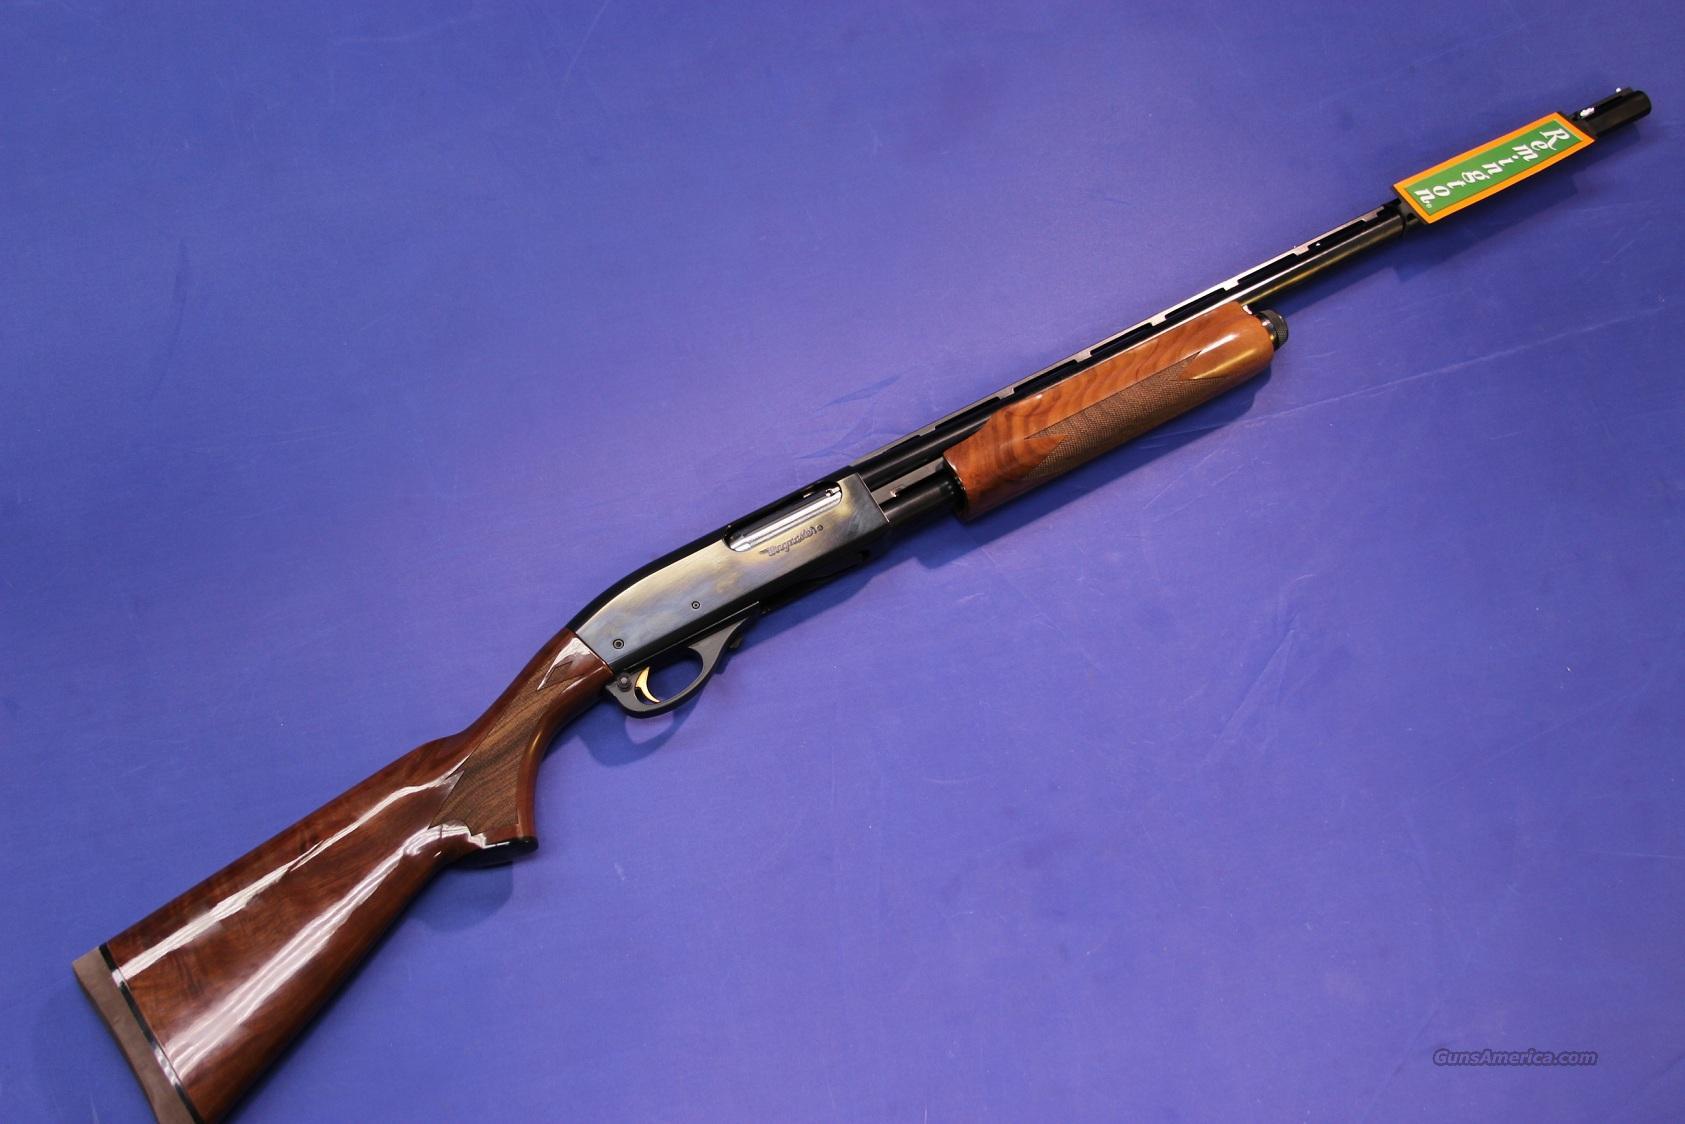 Remington 870 Tactical Stock Options  JosiesK9com